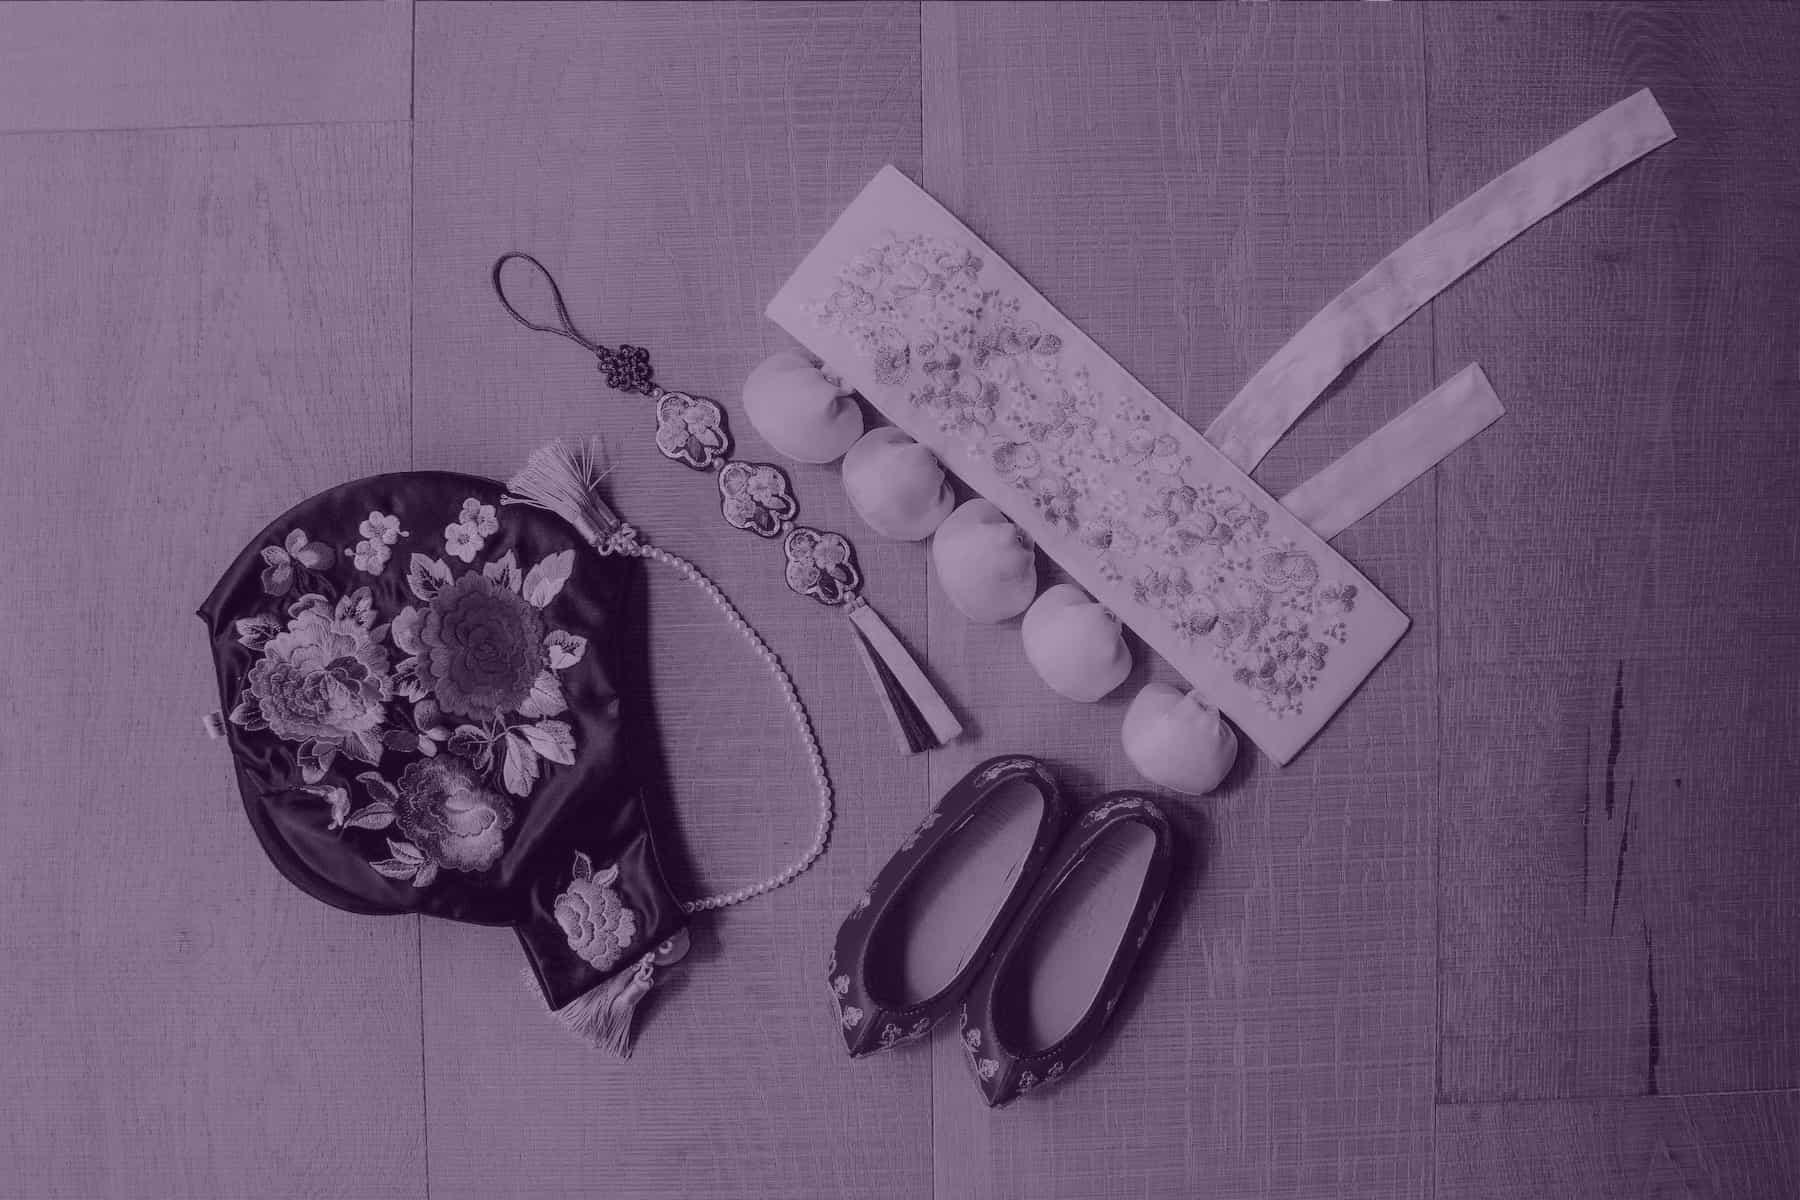 Korean girl's accessories